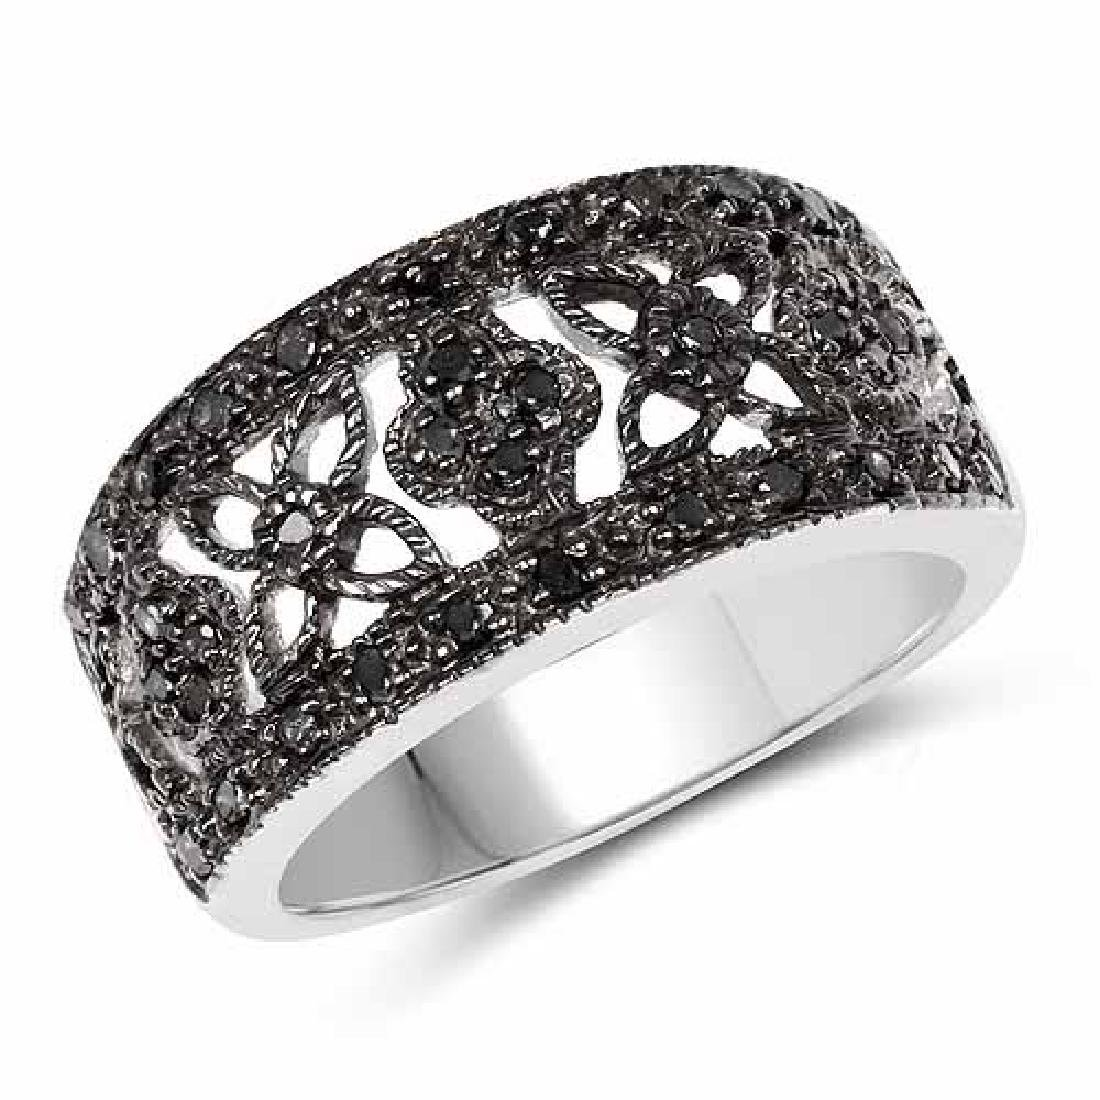 0.28 Carat Genuine Black Diamond .925 Sterling Silver R